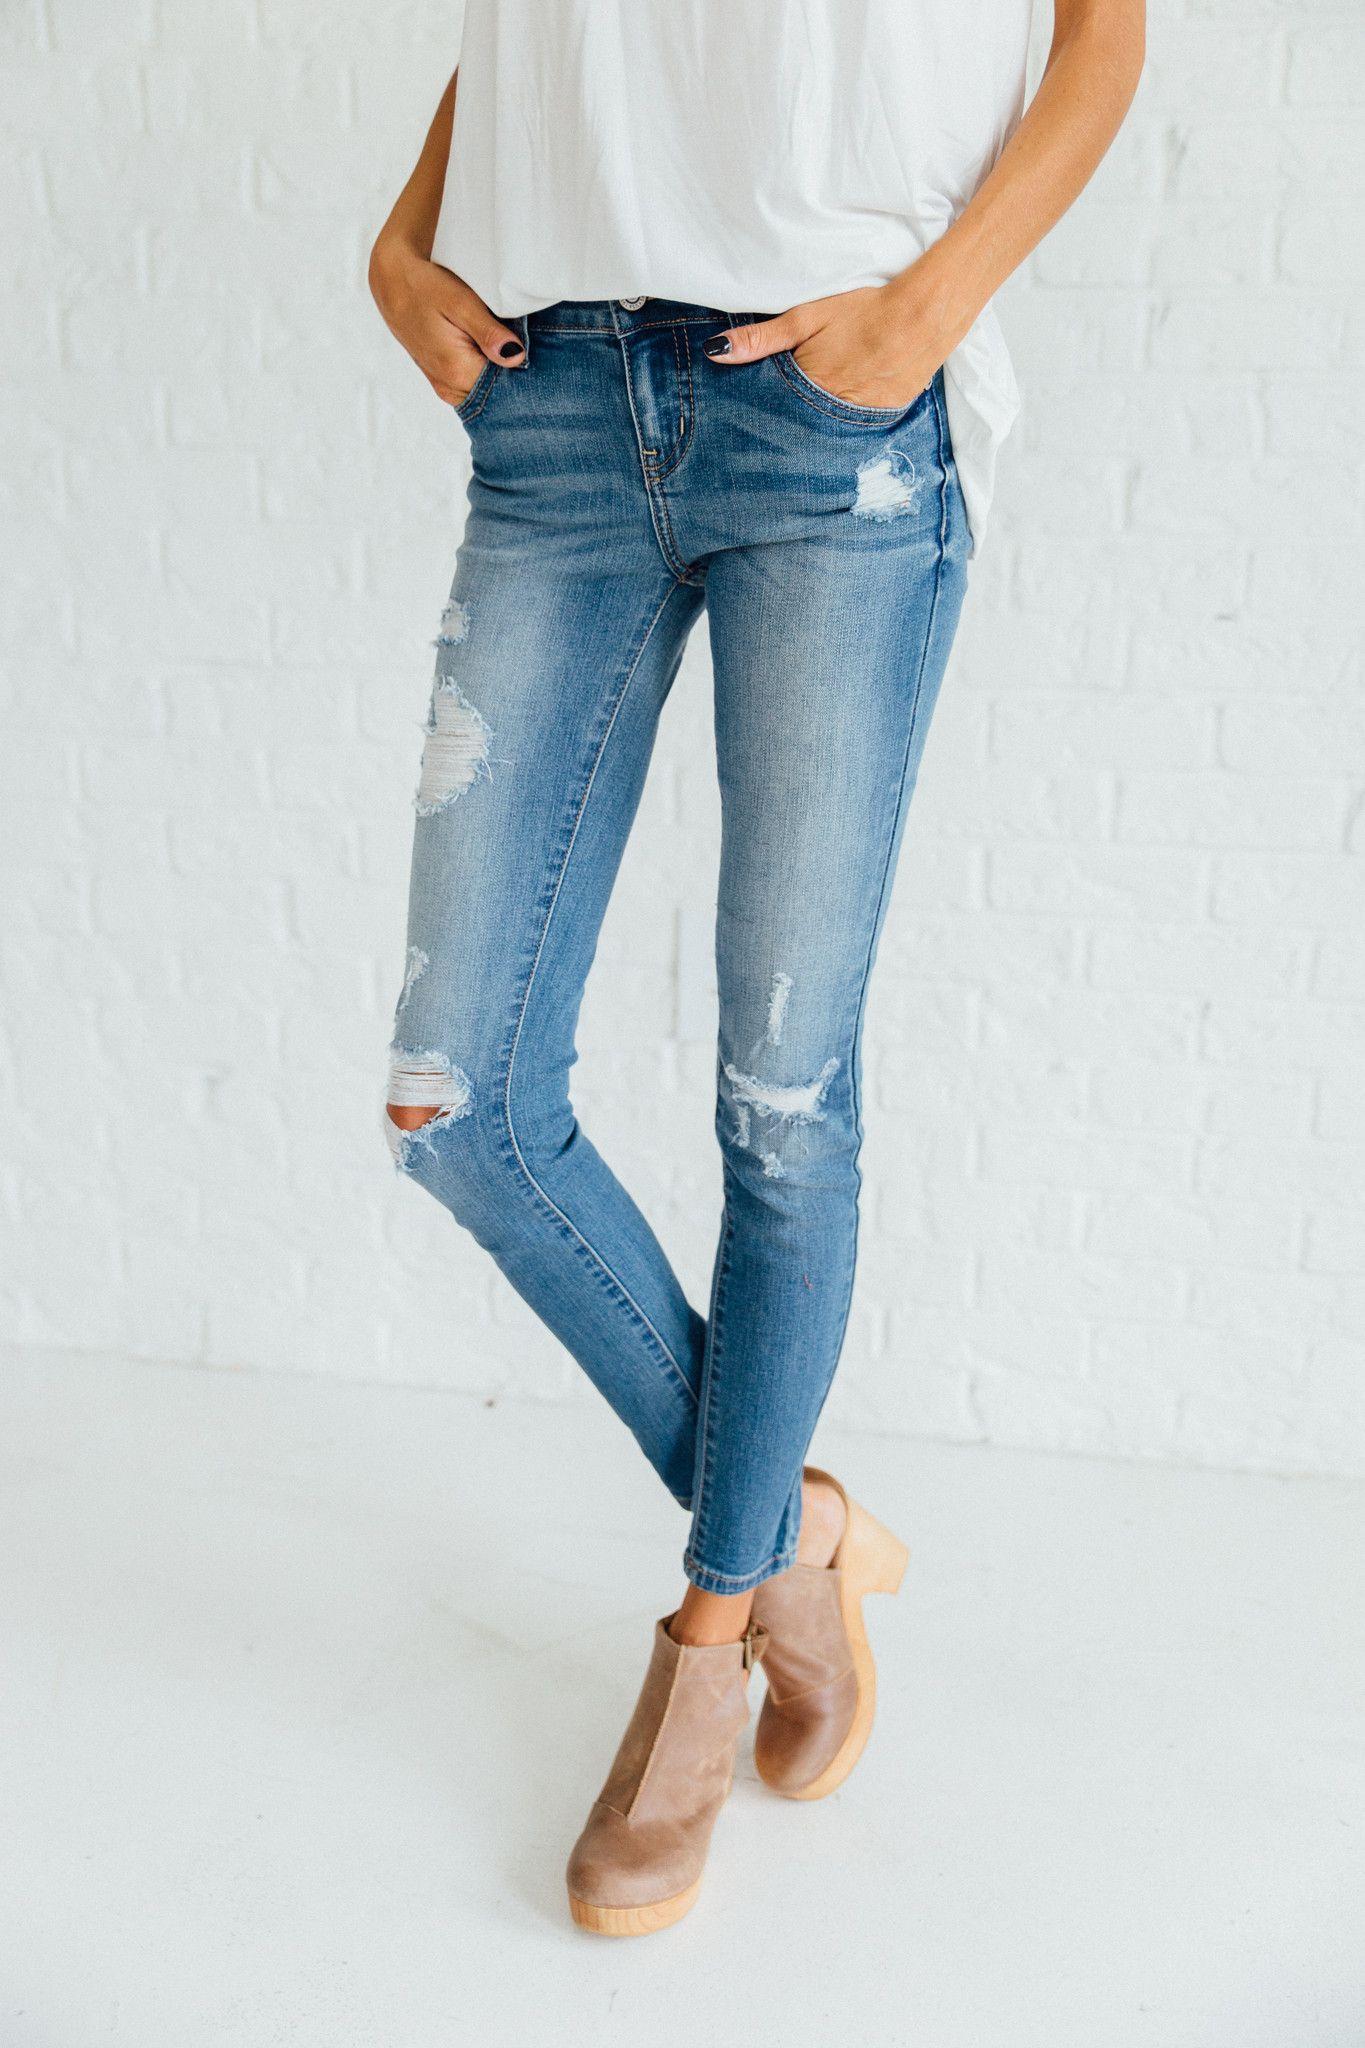 jeans clad